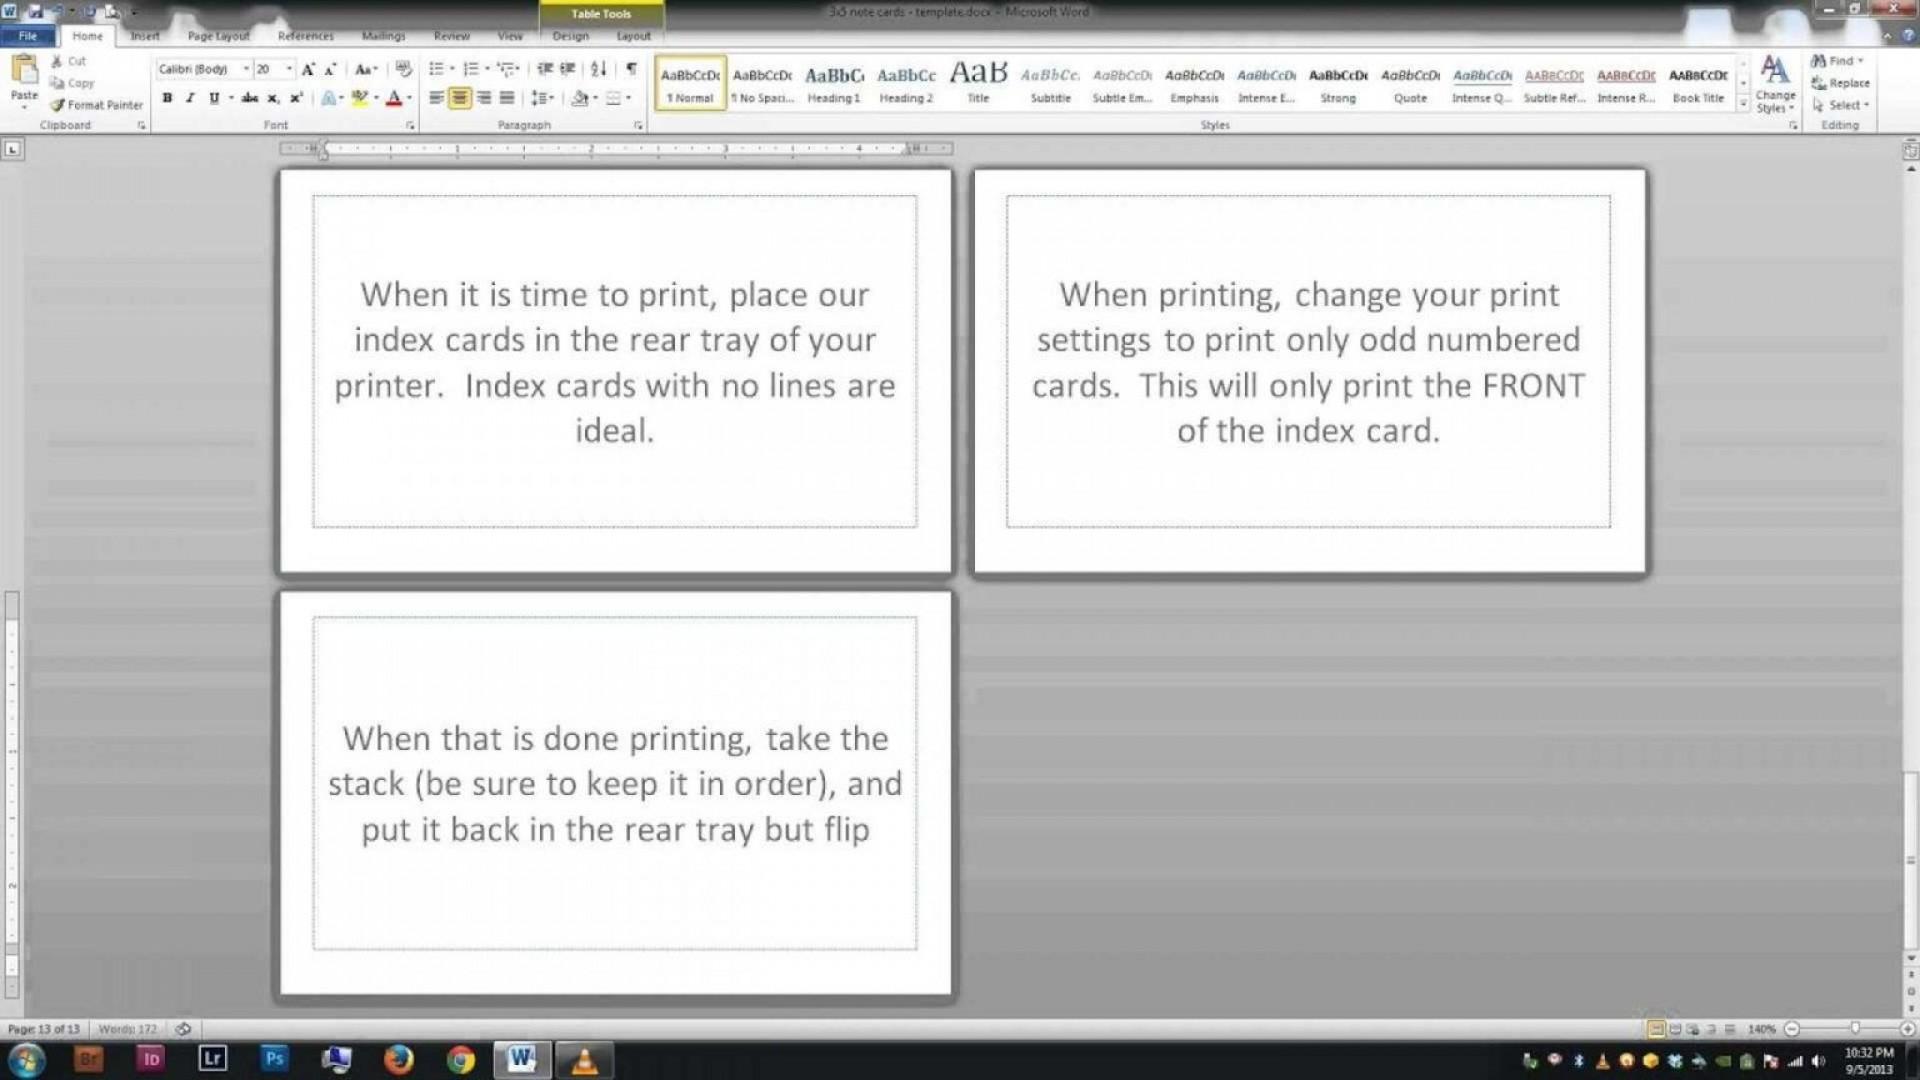 001 Rare 3x5 Index Card Template For Mac High Def 1920